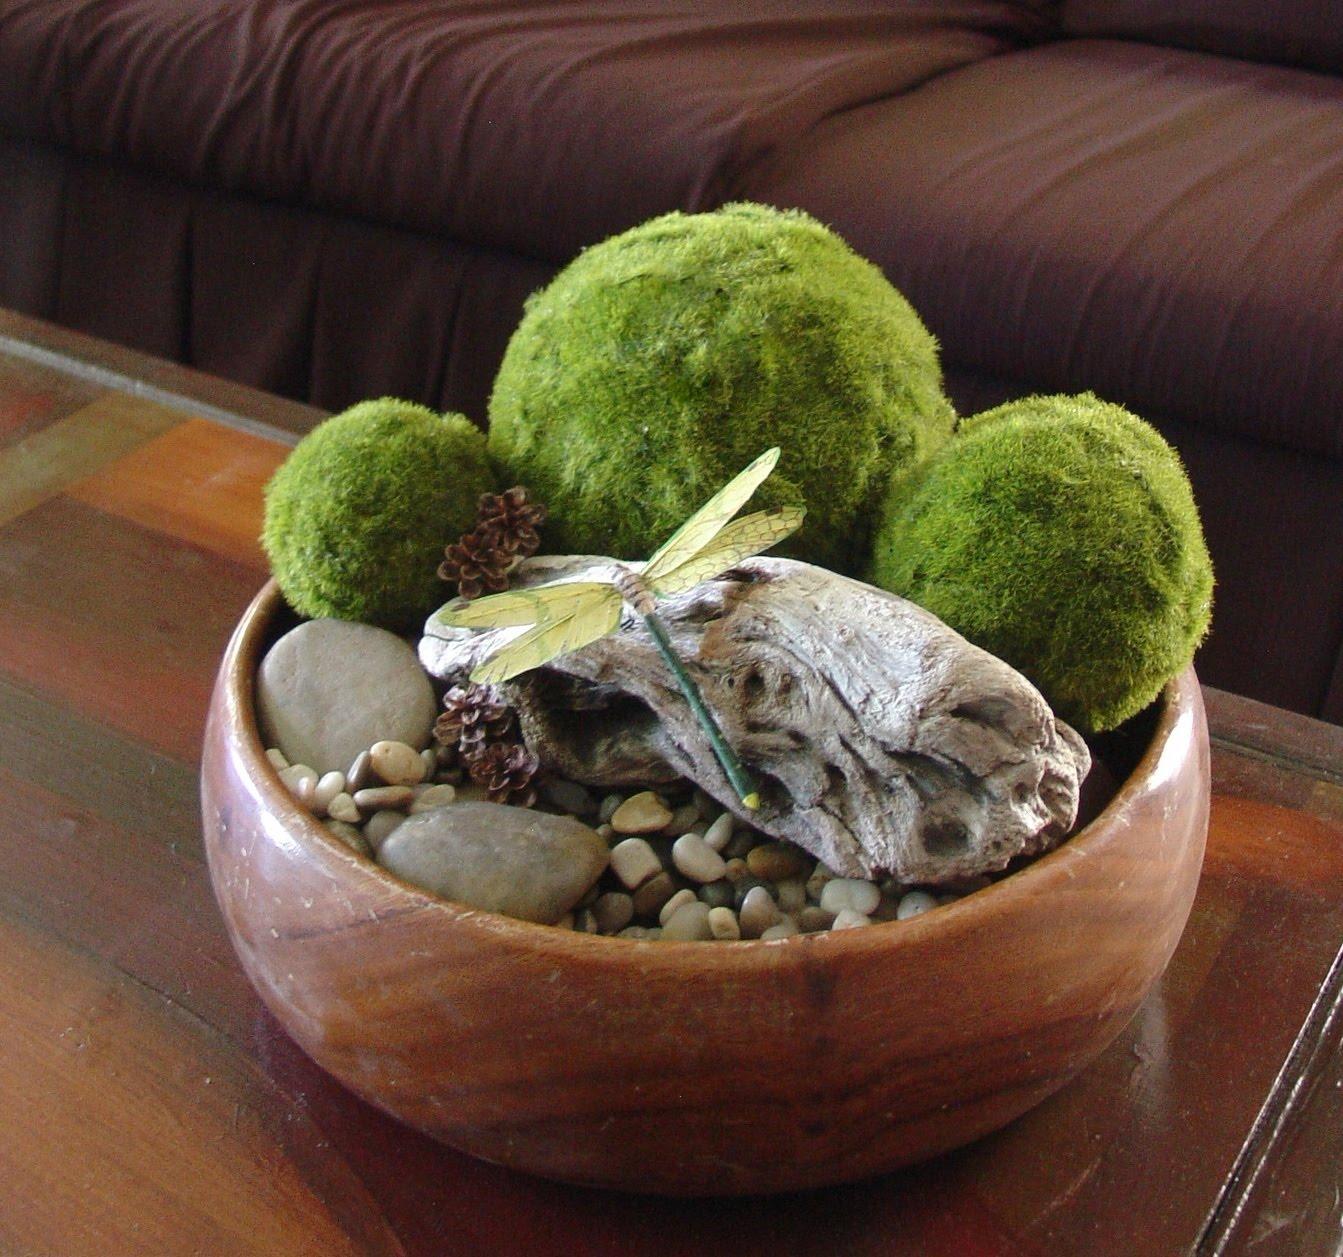 Indoor Moss Garden Greenfain. How To Take Care Of Moss Martha Stewart